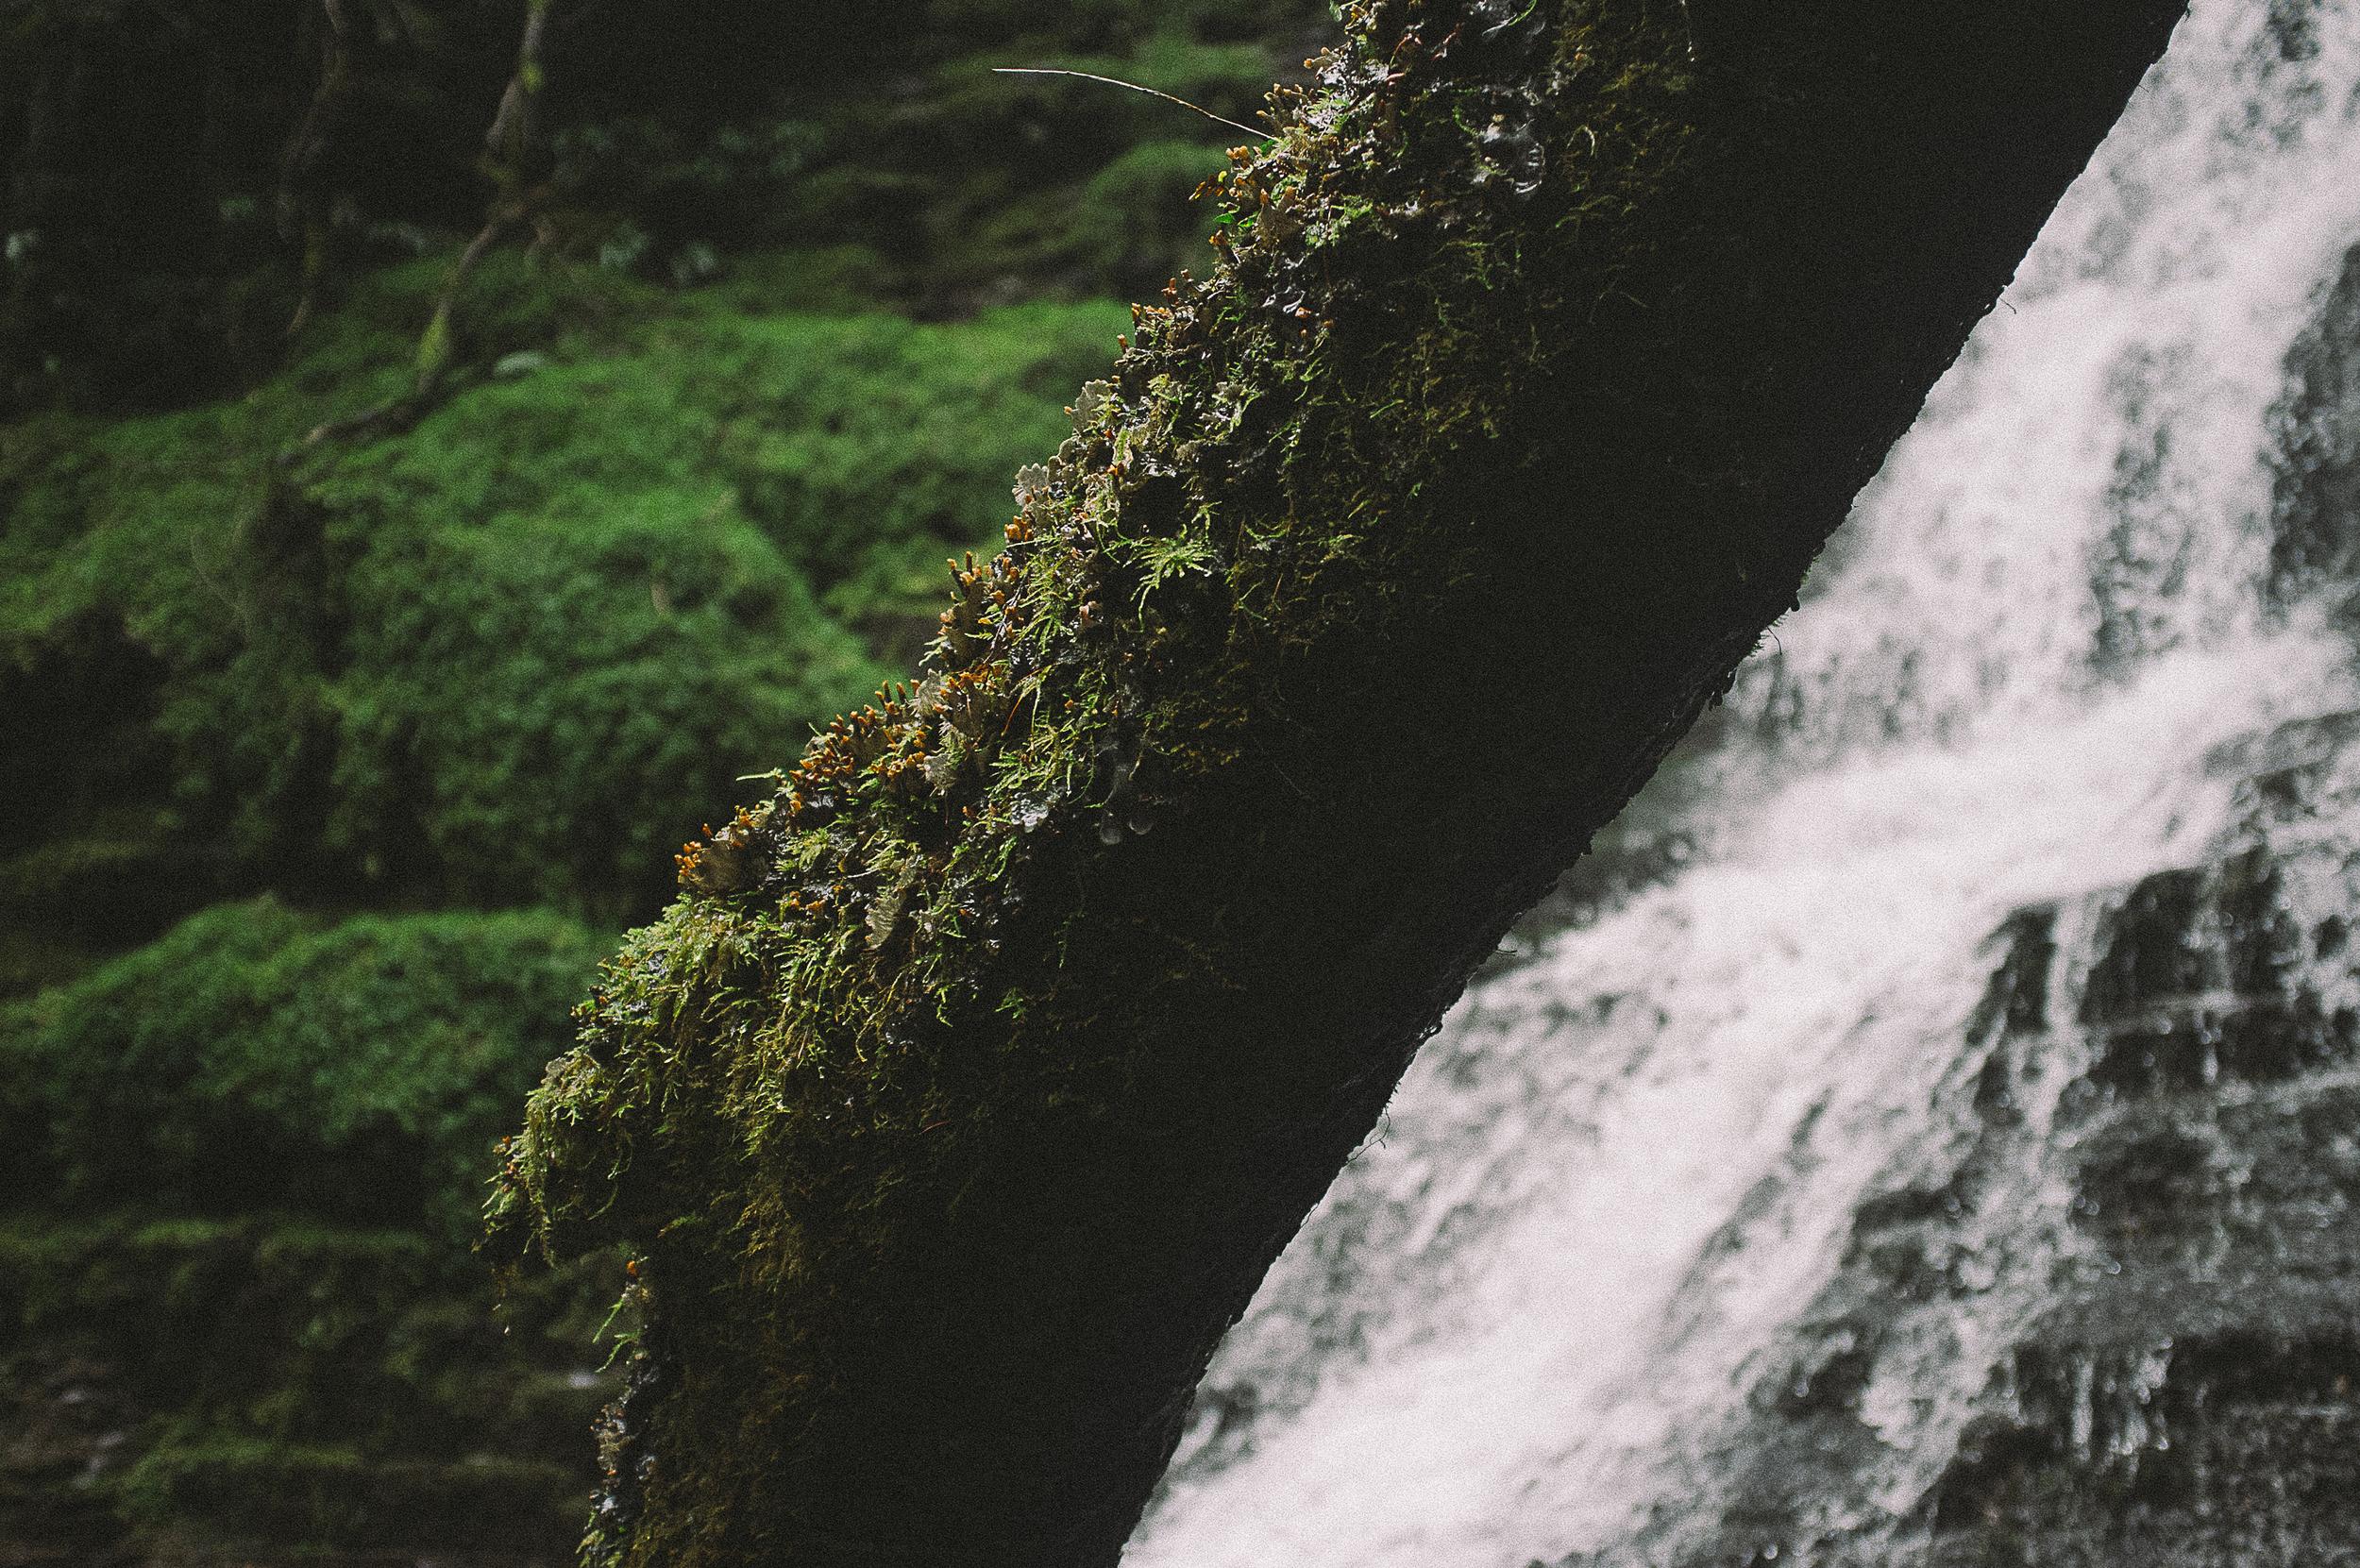 Fuji X100 Waterfall Photography-23.jpg